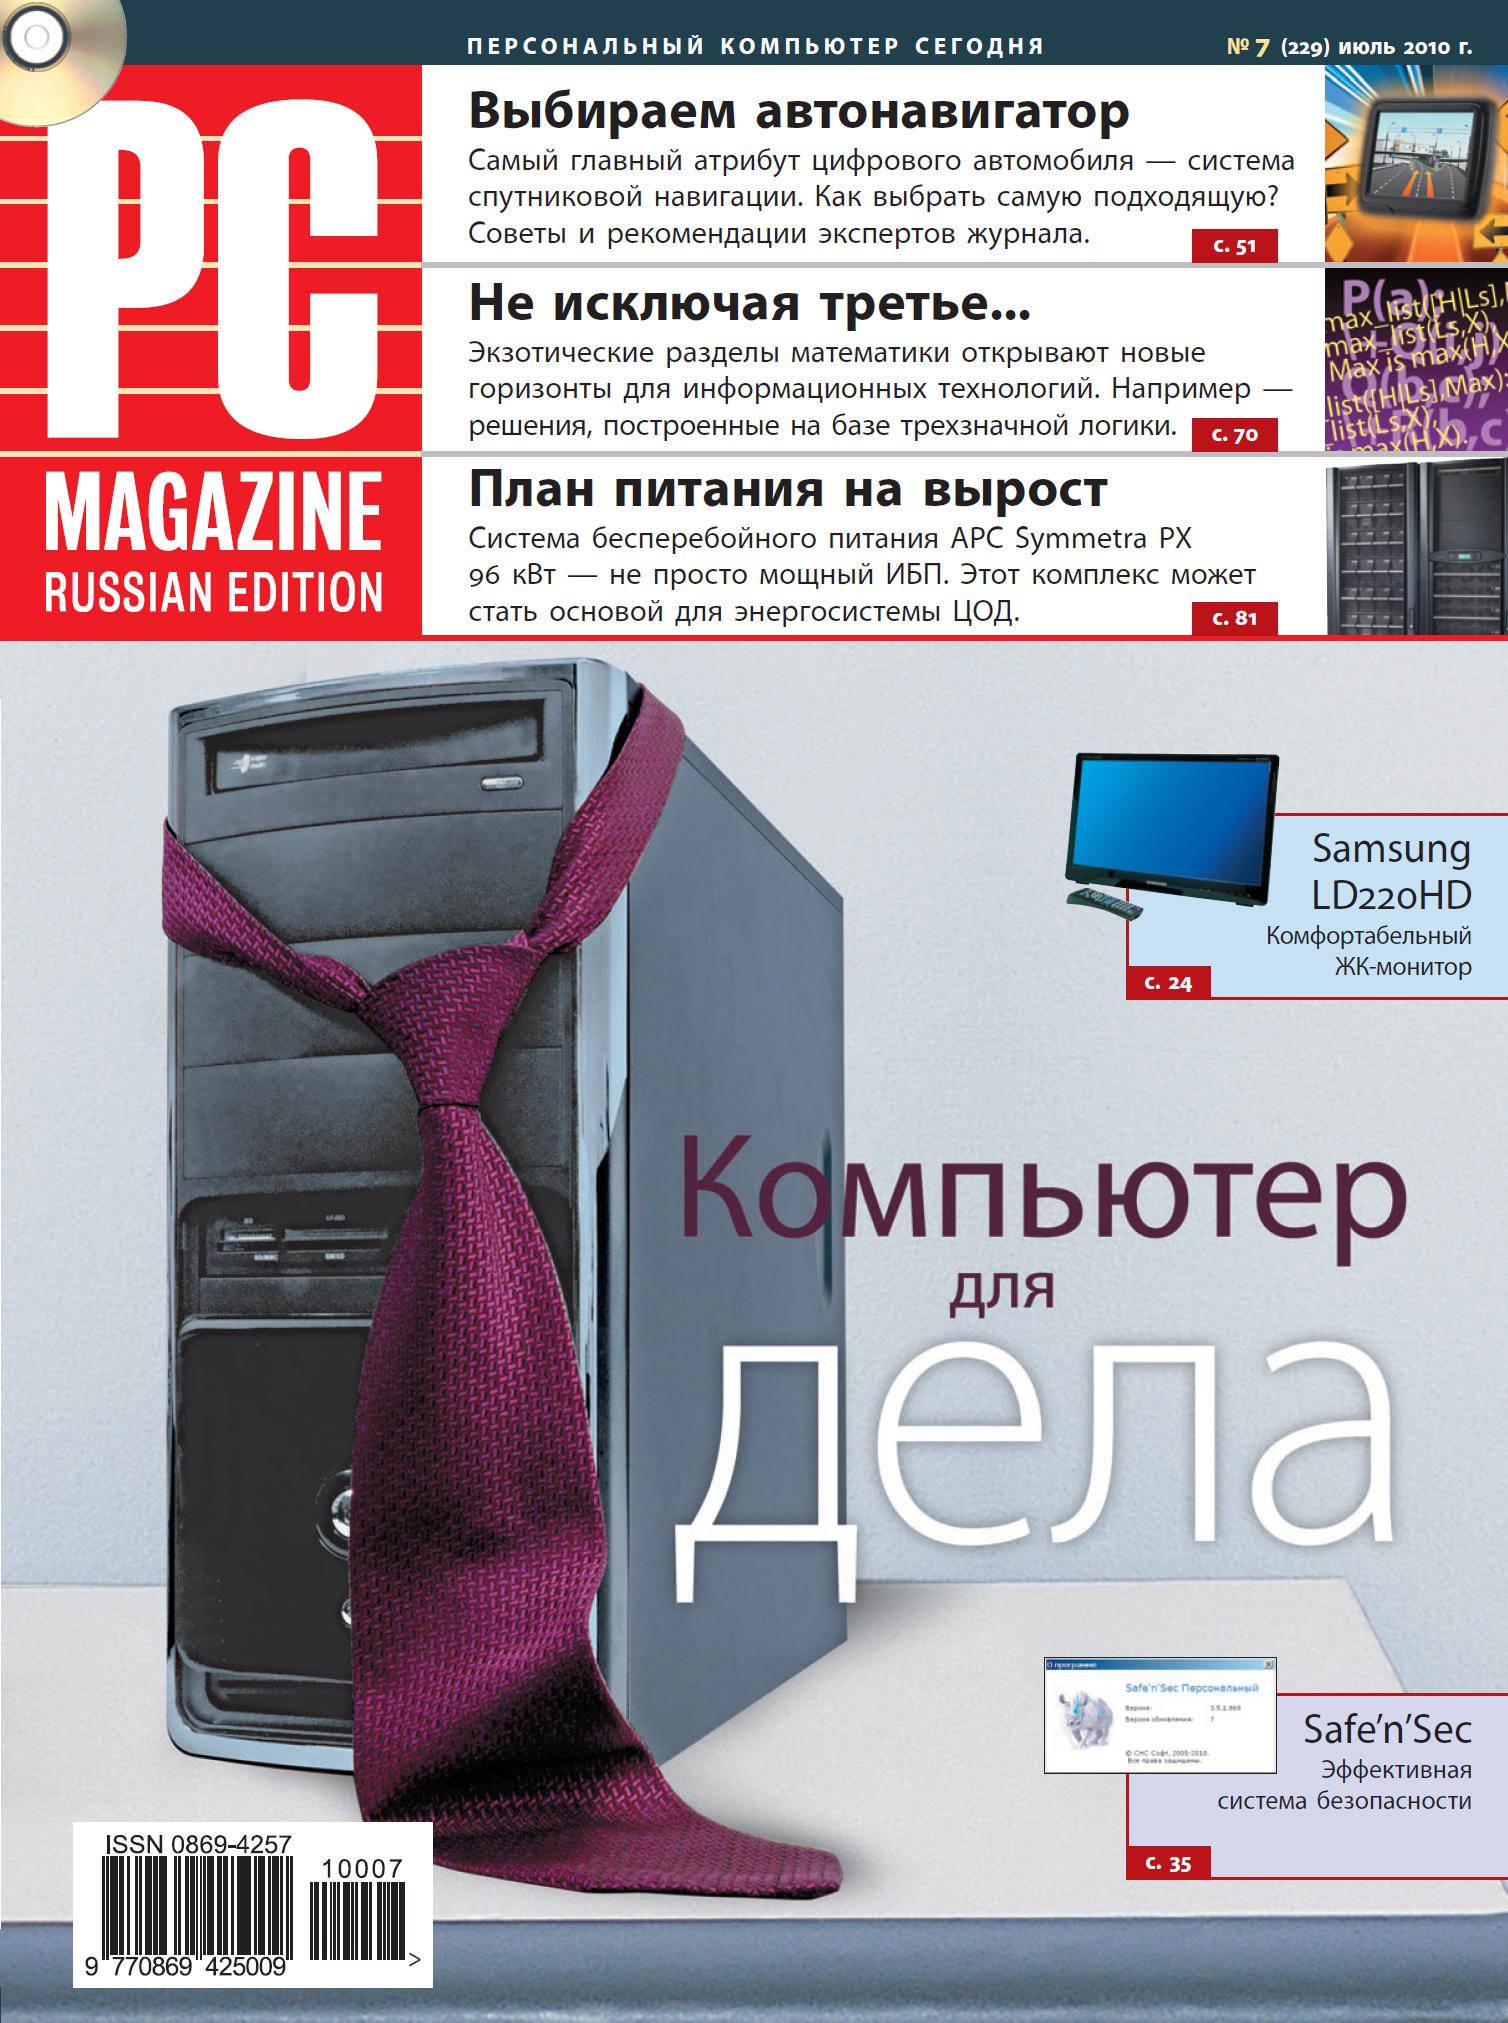 PC Magazine/RE Журнал PC Magazine/RE №07/2010 компьютер